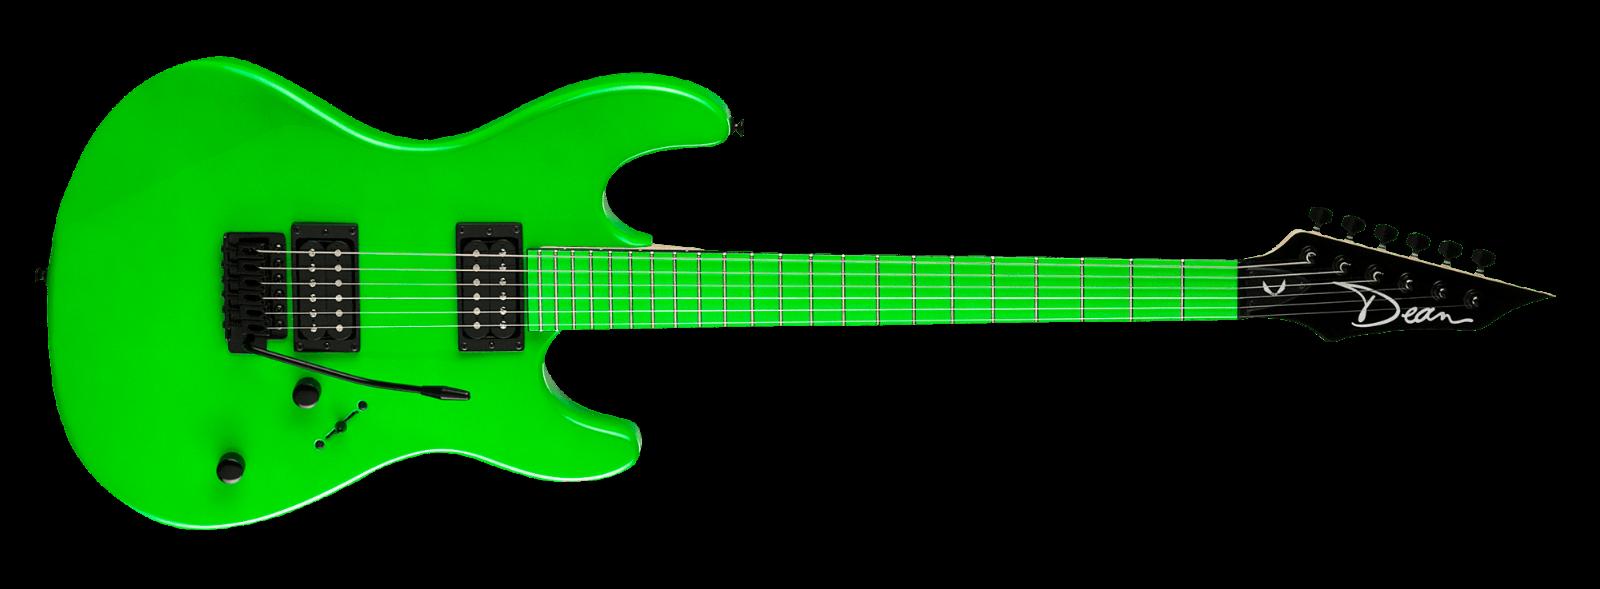 Dean Custom Zone Electric Guitar New Nuclear Green 2 Humbuckers Tremolo Price 229 99 Guitars Fo Electric Guitar Acoustic Guitar For Sale Guitar